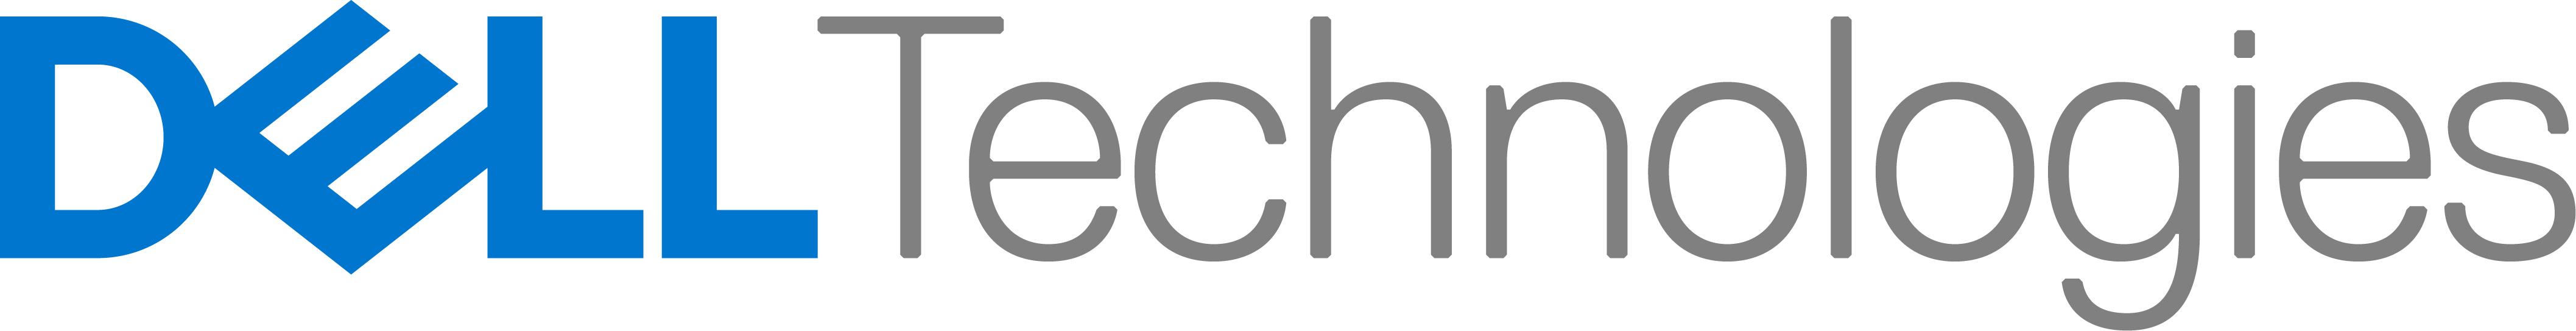 Dell Technologies Company Logo